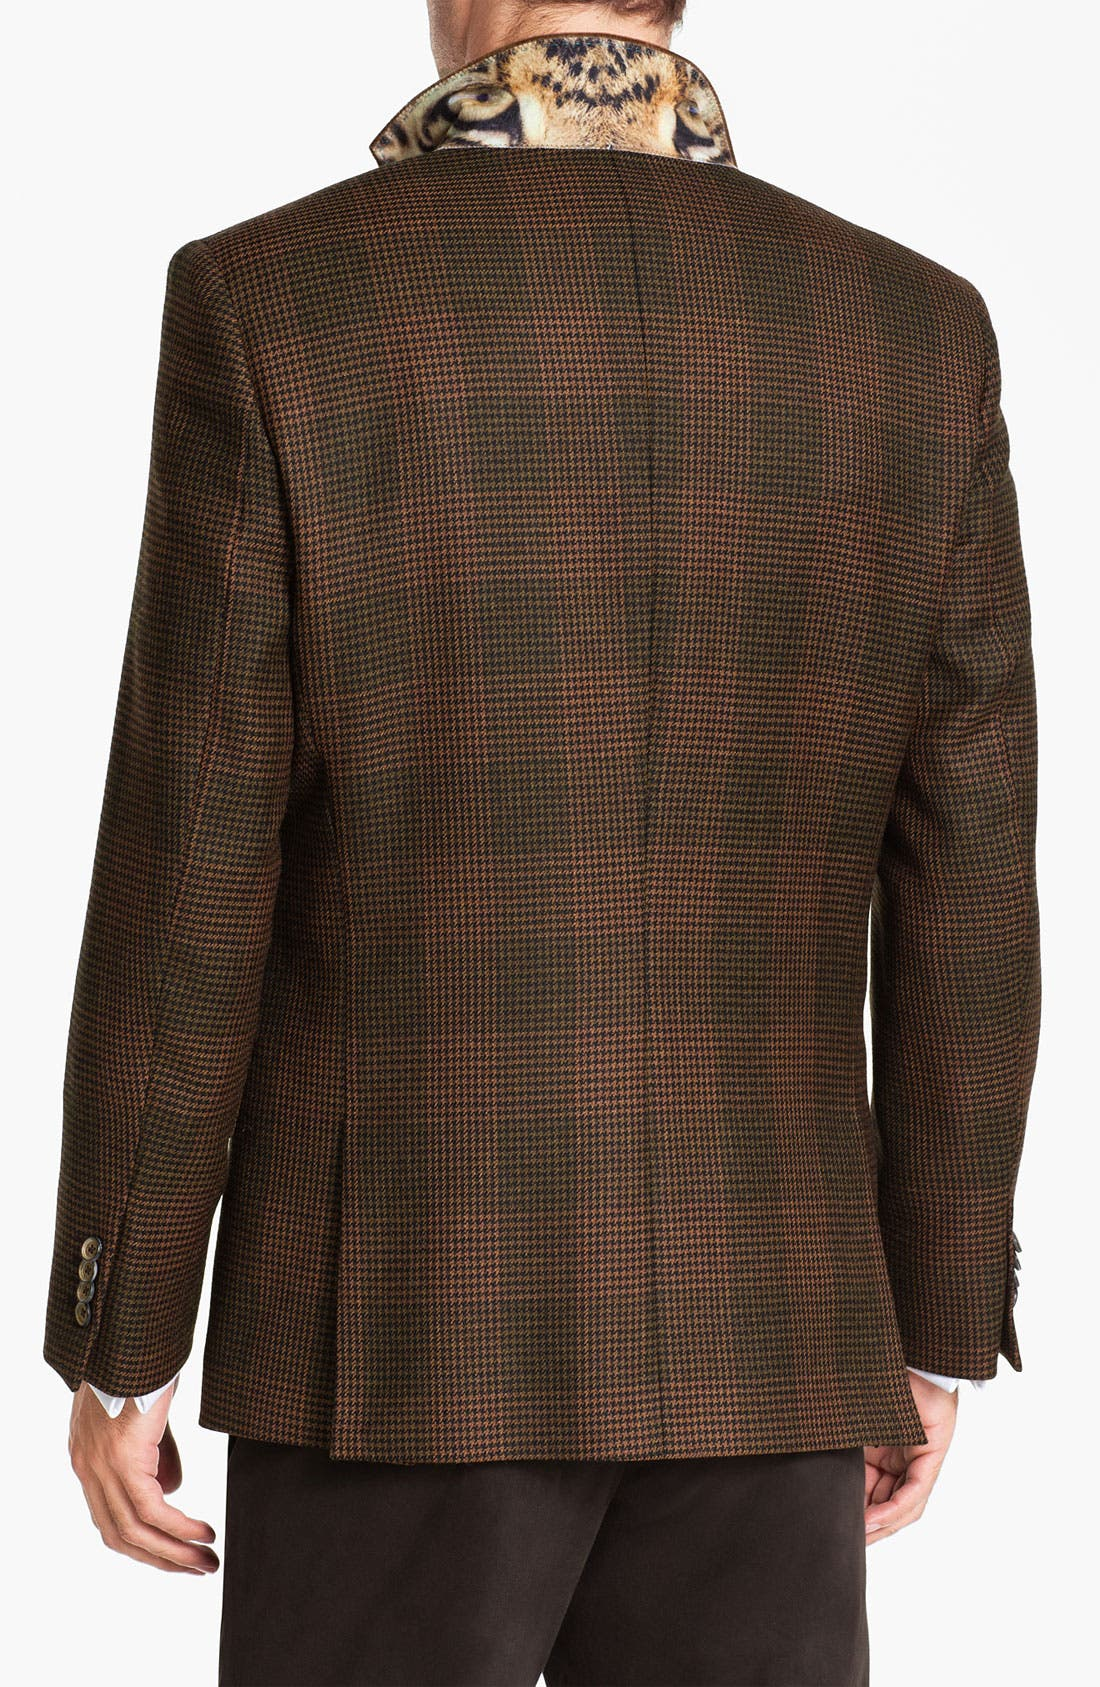 Alternate Image 2  - Ted Baker London 'Global' Trim Fit Check Sportcoat